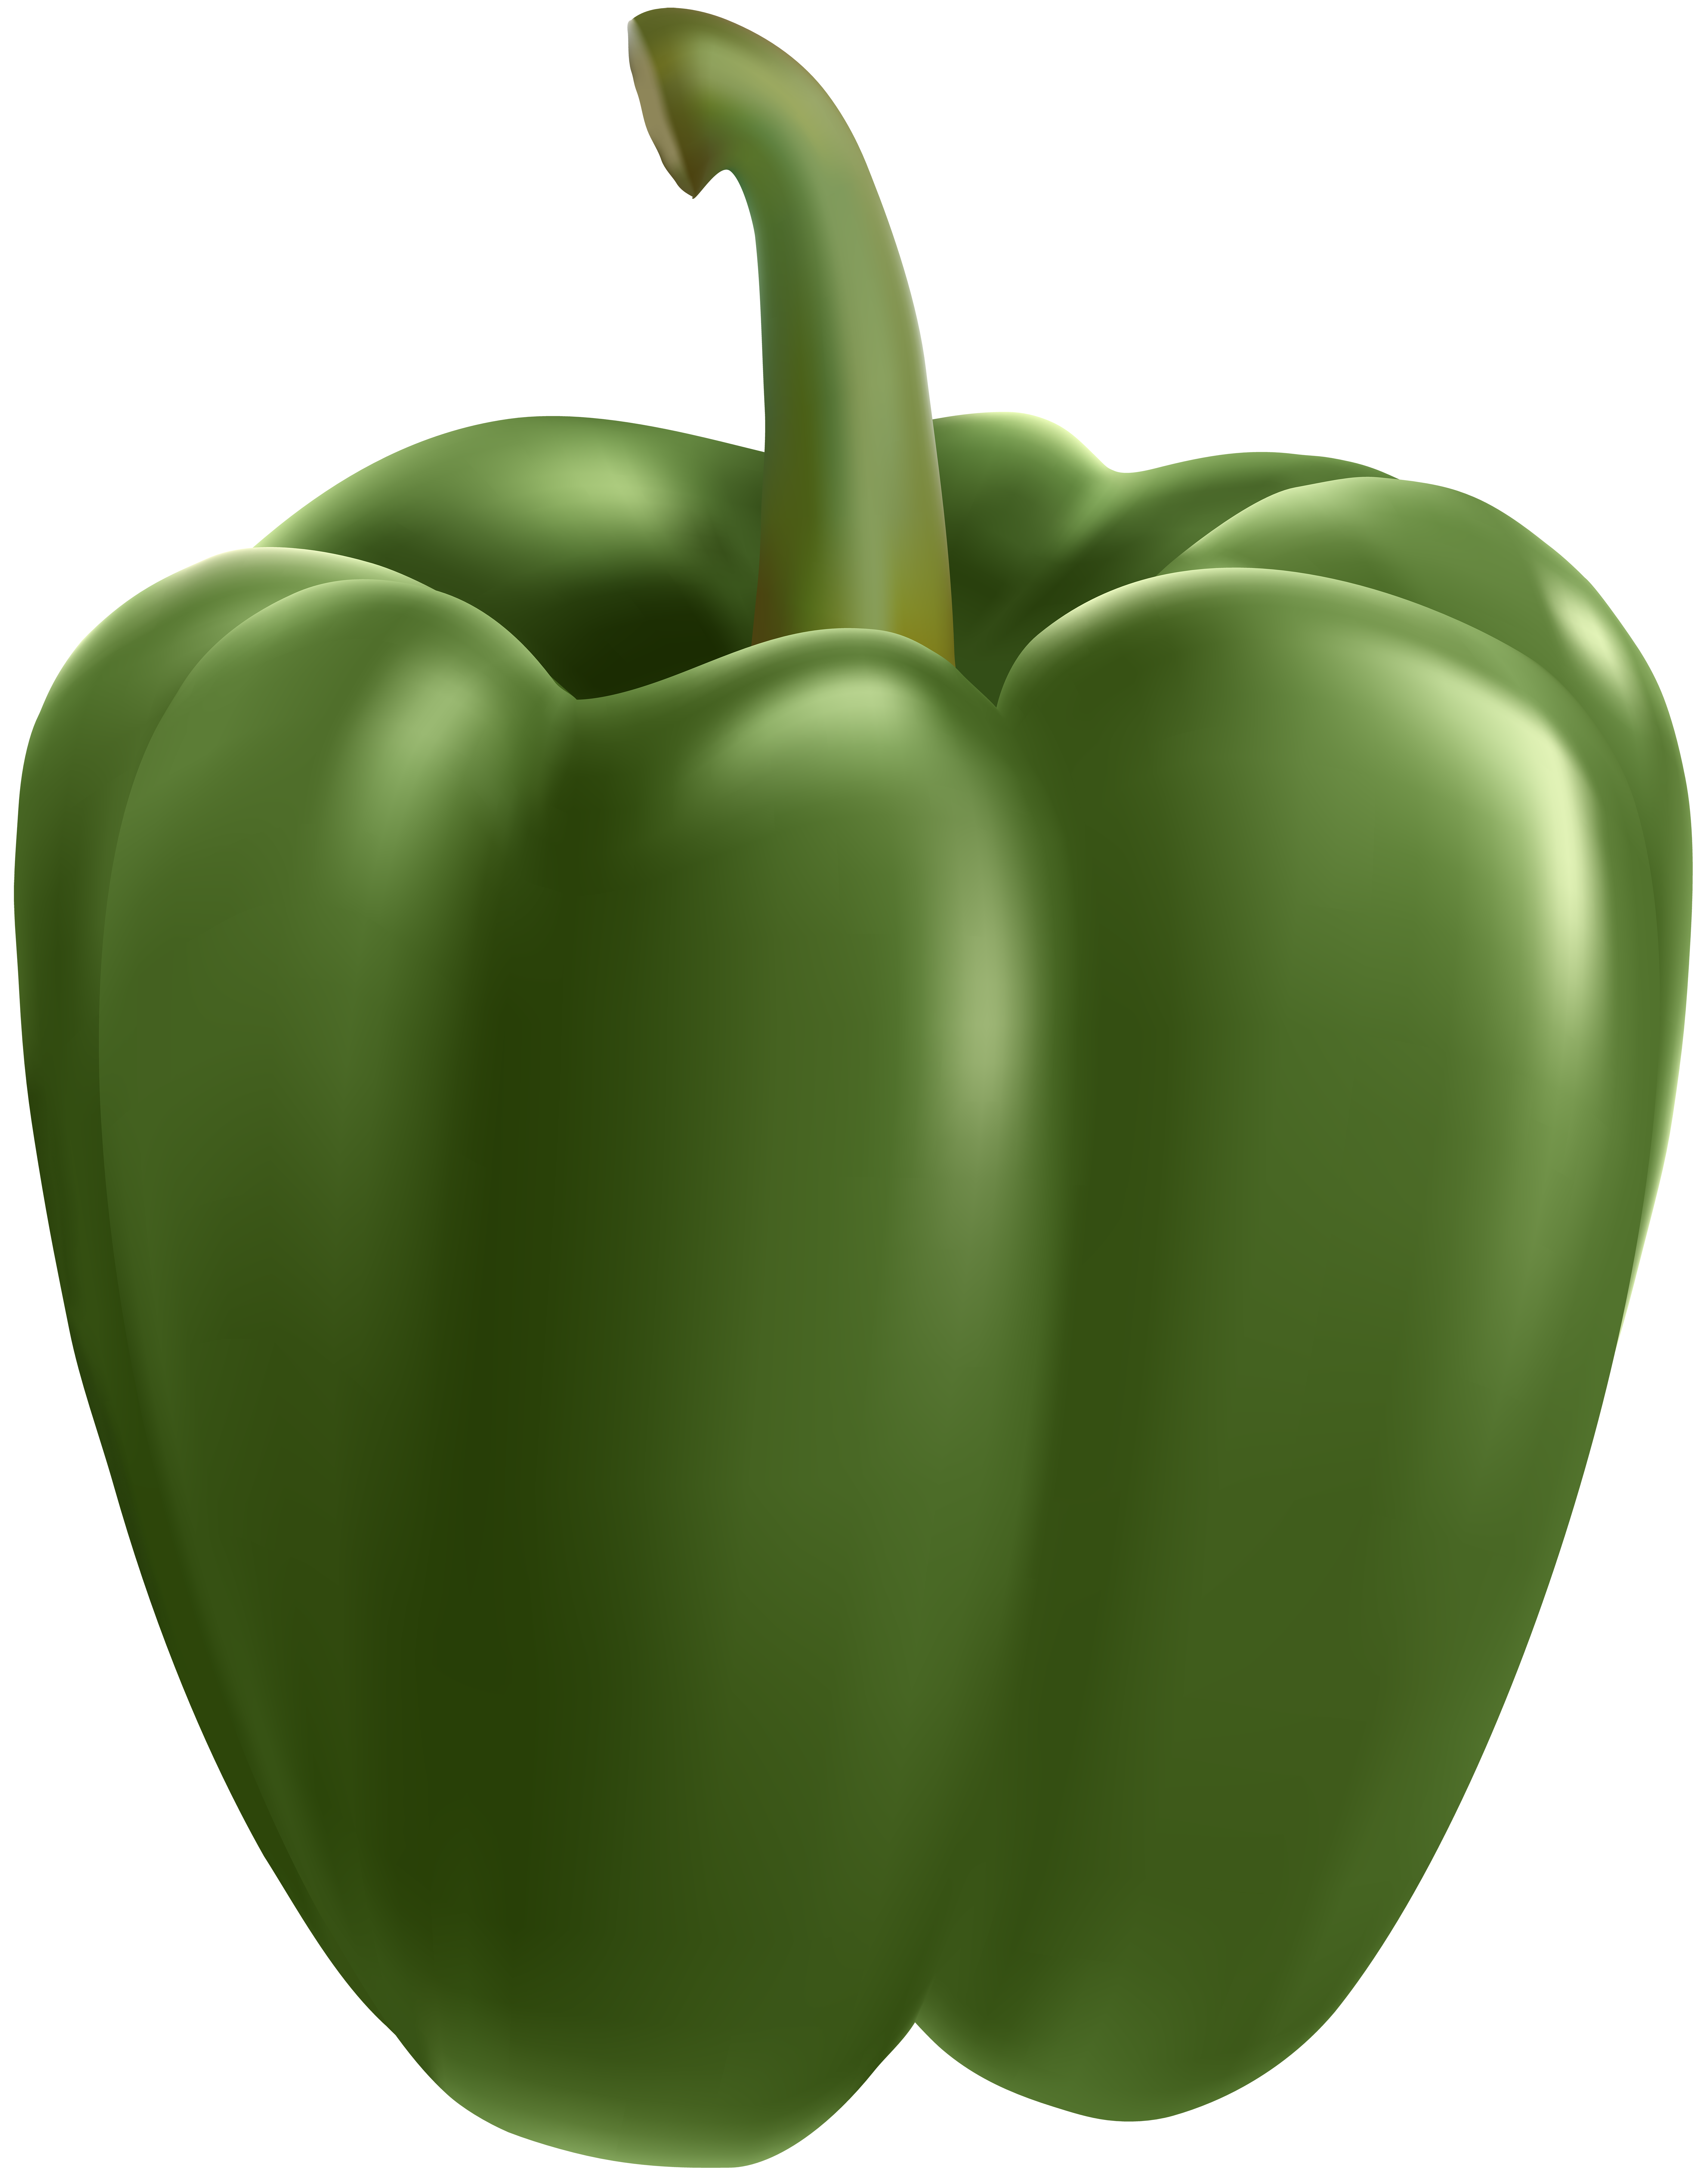 Green bell transparent clip. Pepper clipart happy